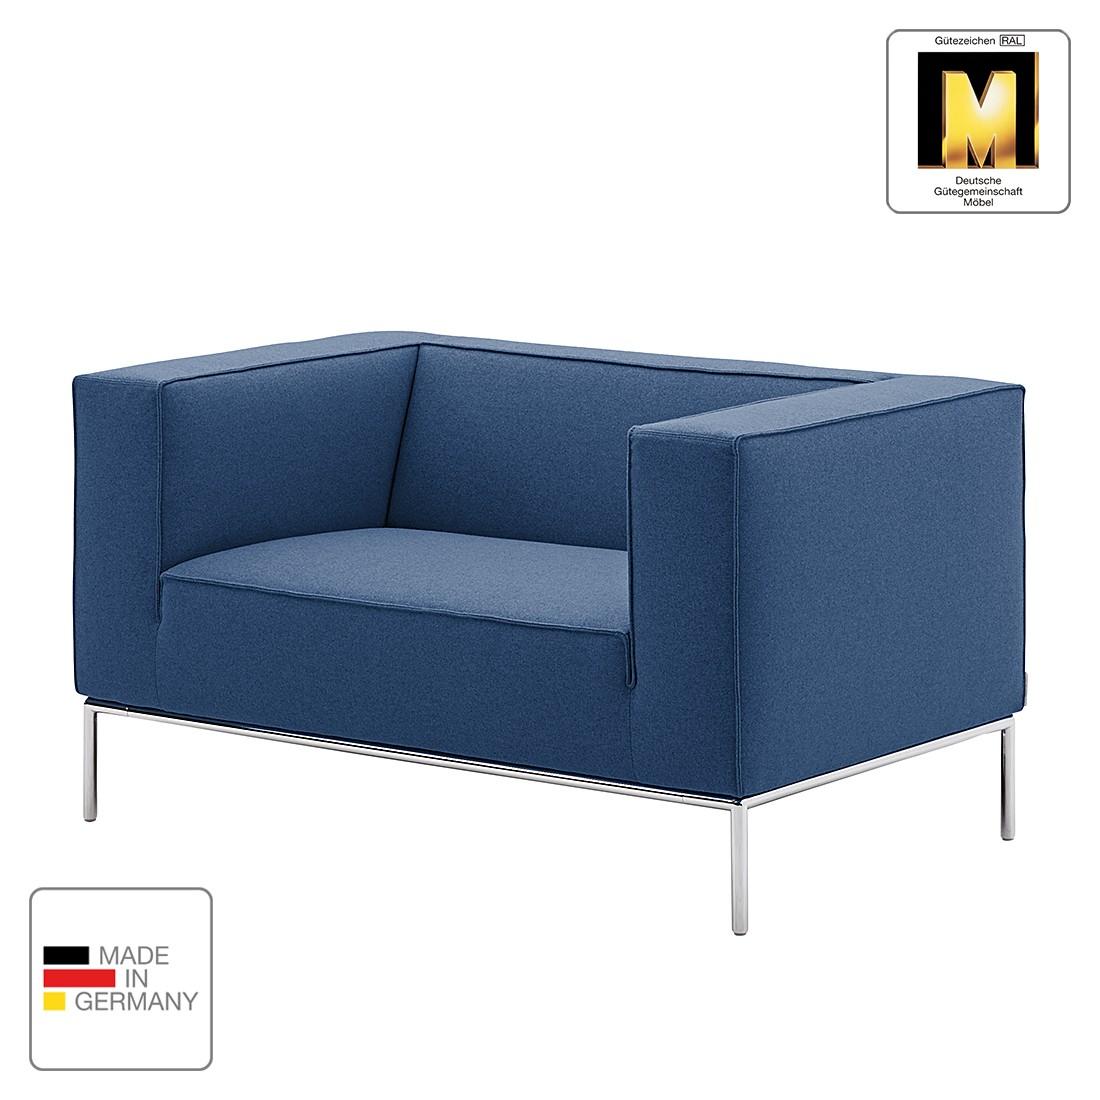 Sessel Greg - Webstoff - Blau - 1 Kissen, Machalke Polsterwerkstätten